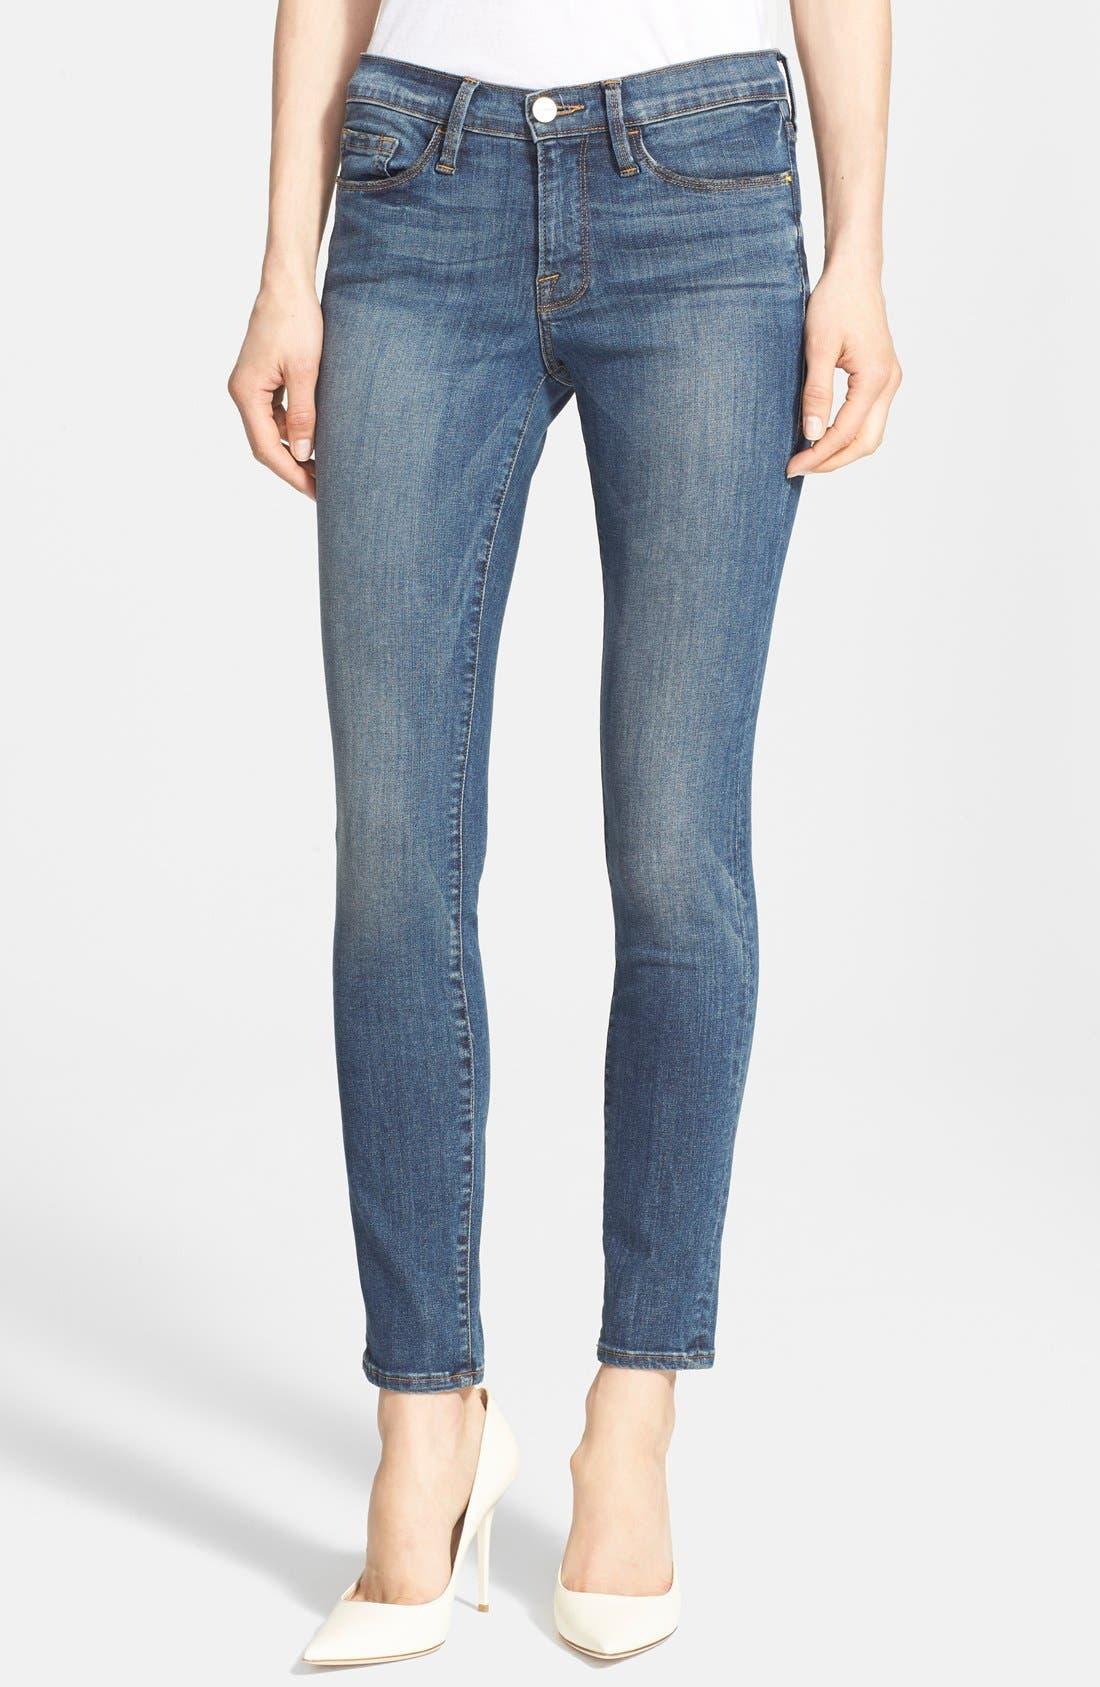 Alternate Image 1 Selected - Frame Denim 'Le Skinny de Jeanne' Jeans